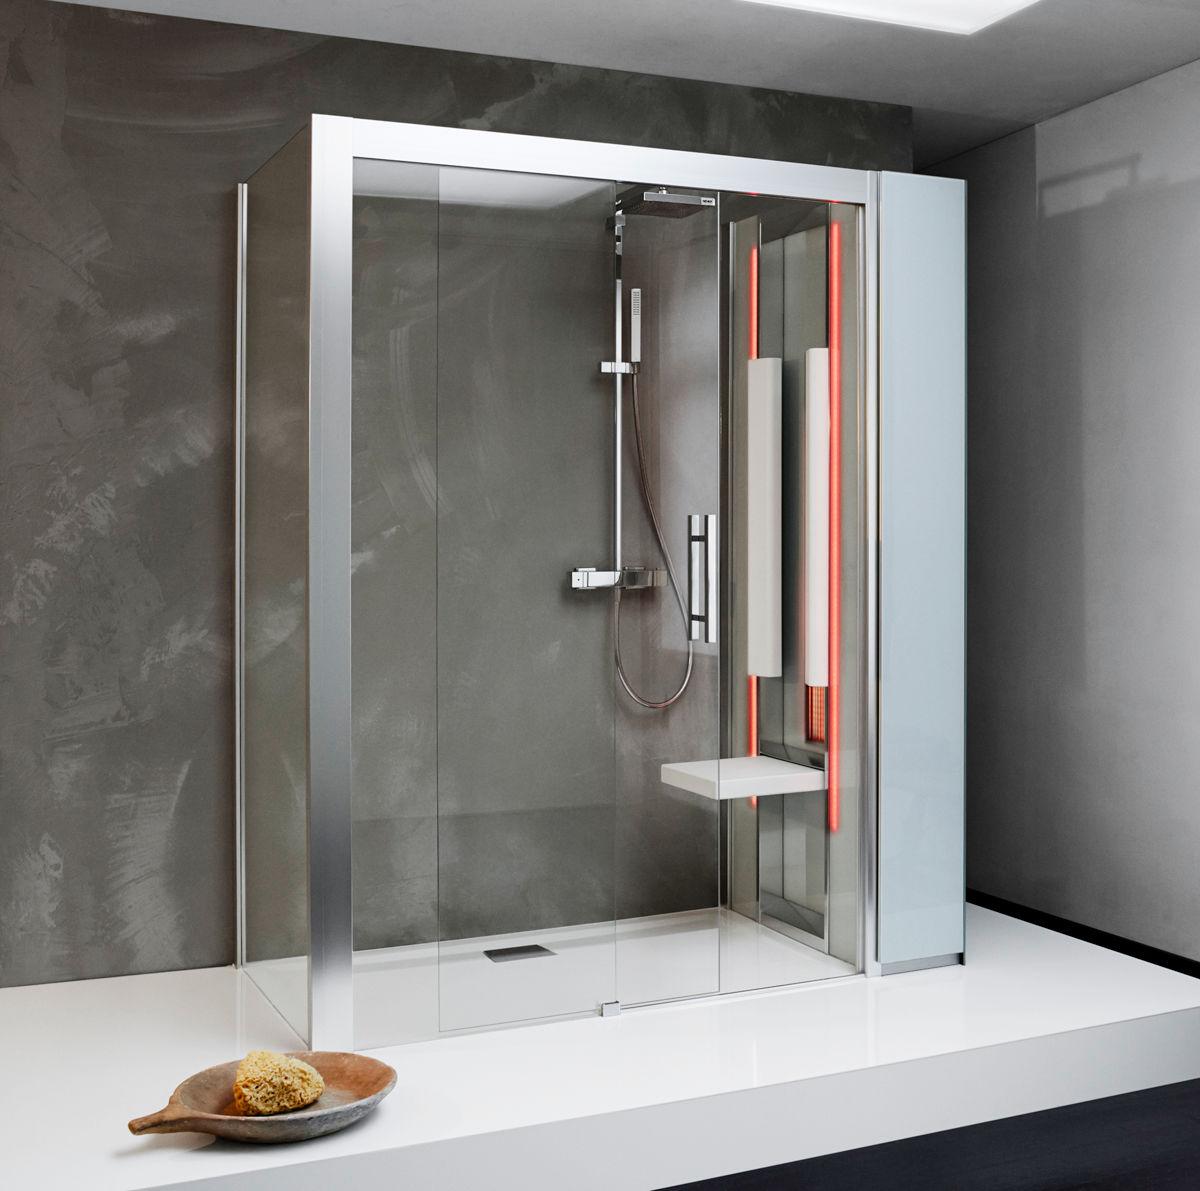 privates spa zuhause wohnen. Black Bedroom Furniture Sets. Home Design Ideas